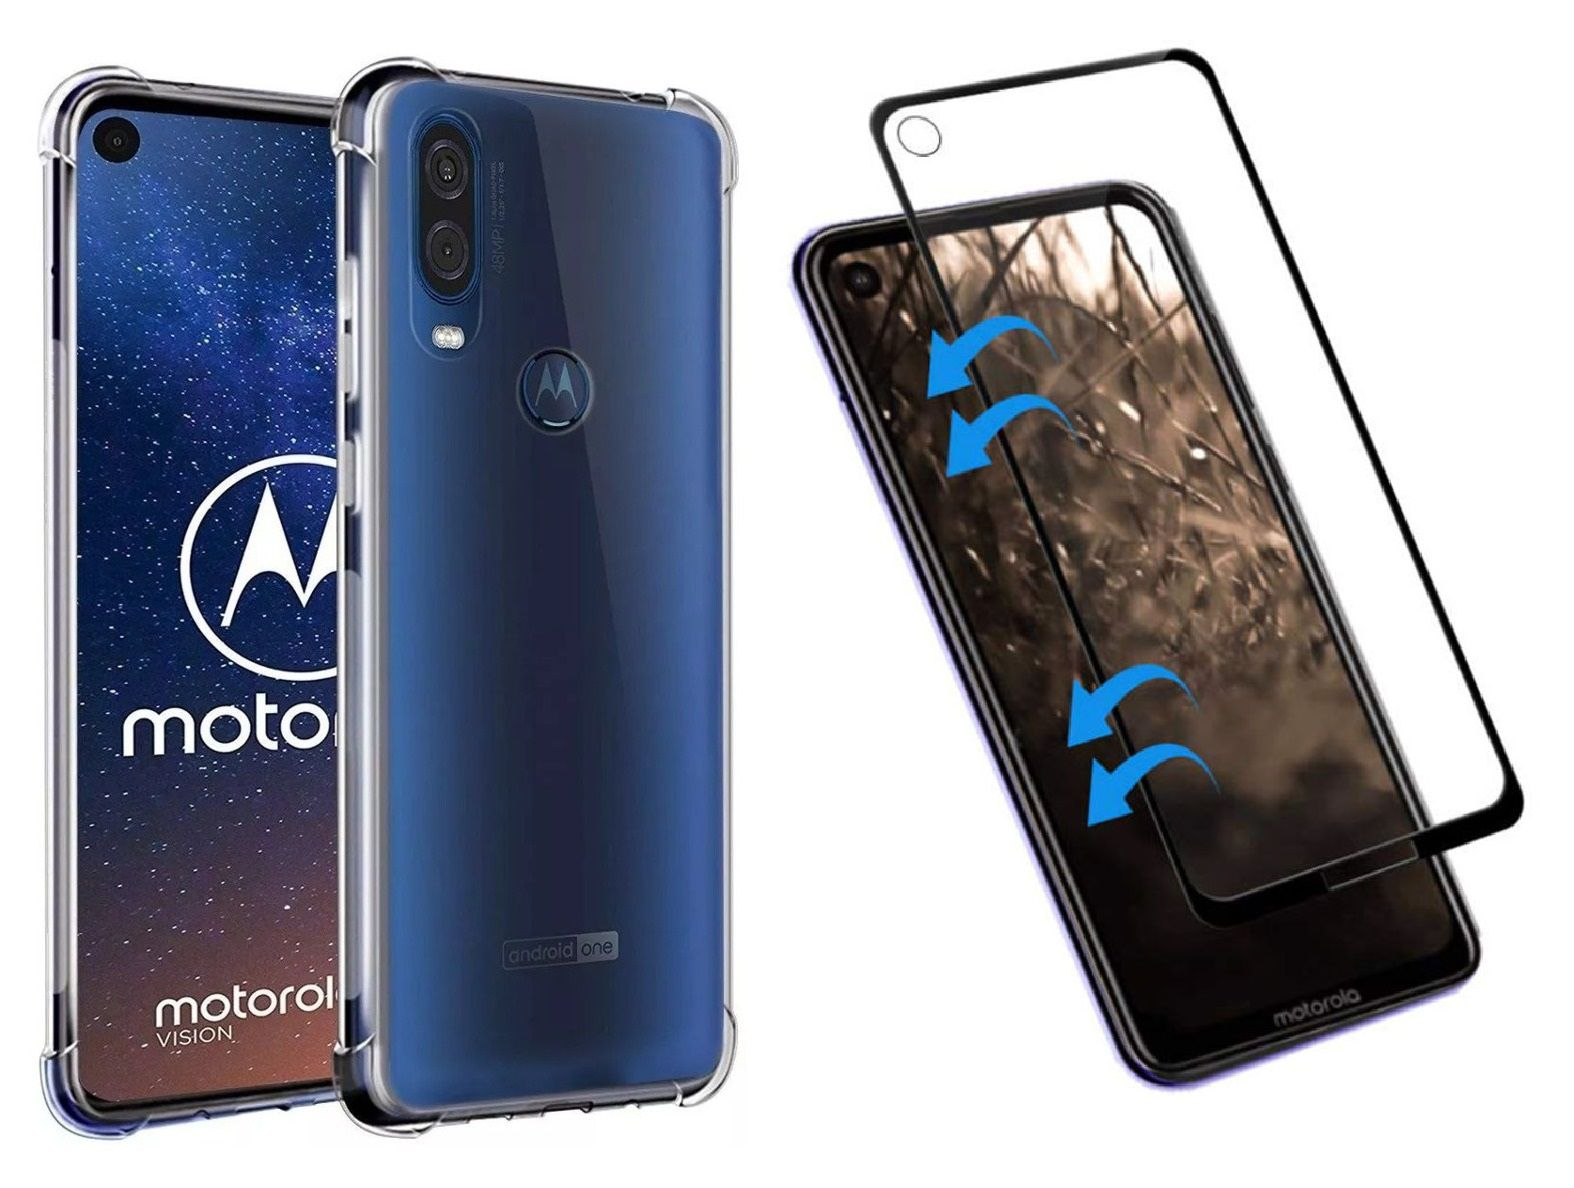 Capinha Anti-Shock + Película 5D Vidro Motorola One, One Vision, Action